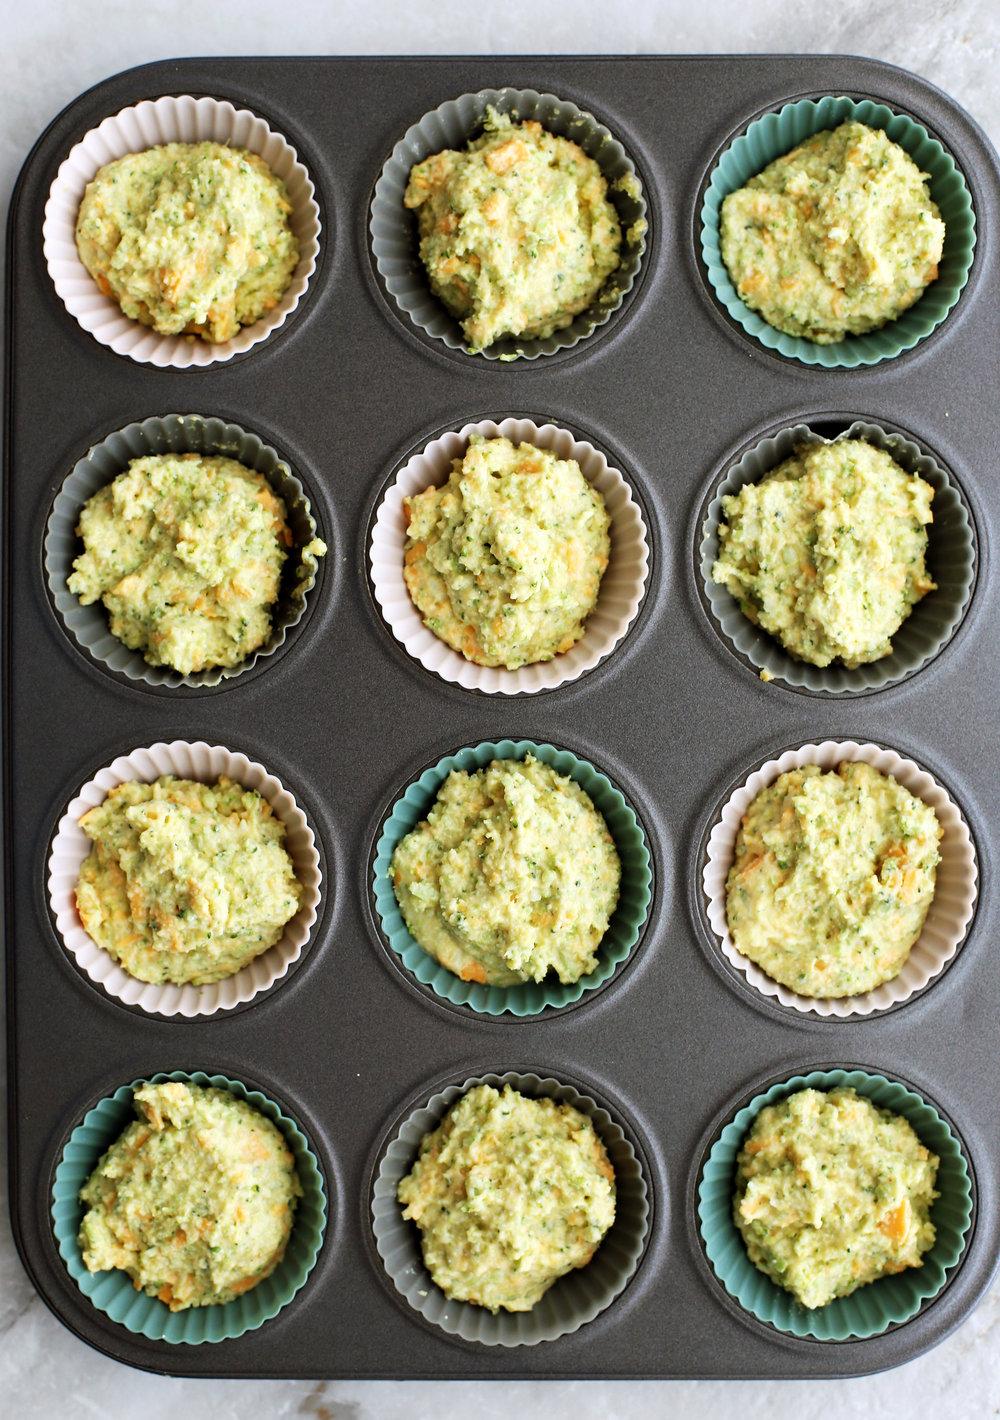 Broccoli Cheddar Cornbread Muffin batter scooped into a muffin pan.